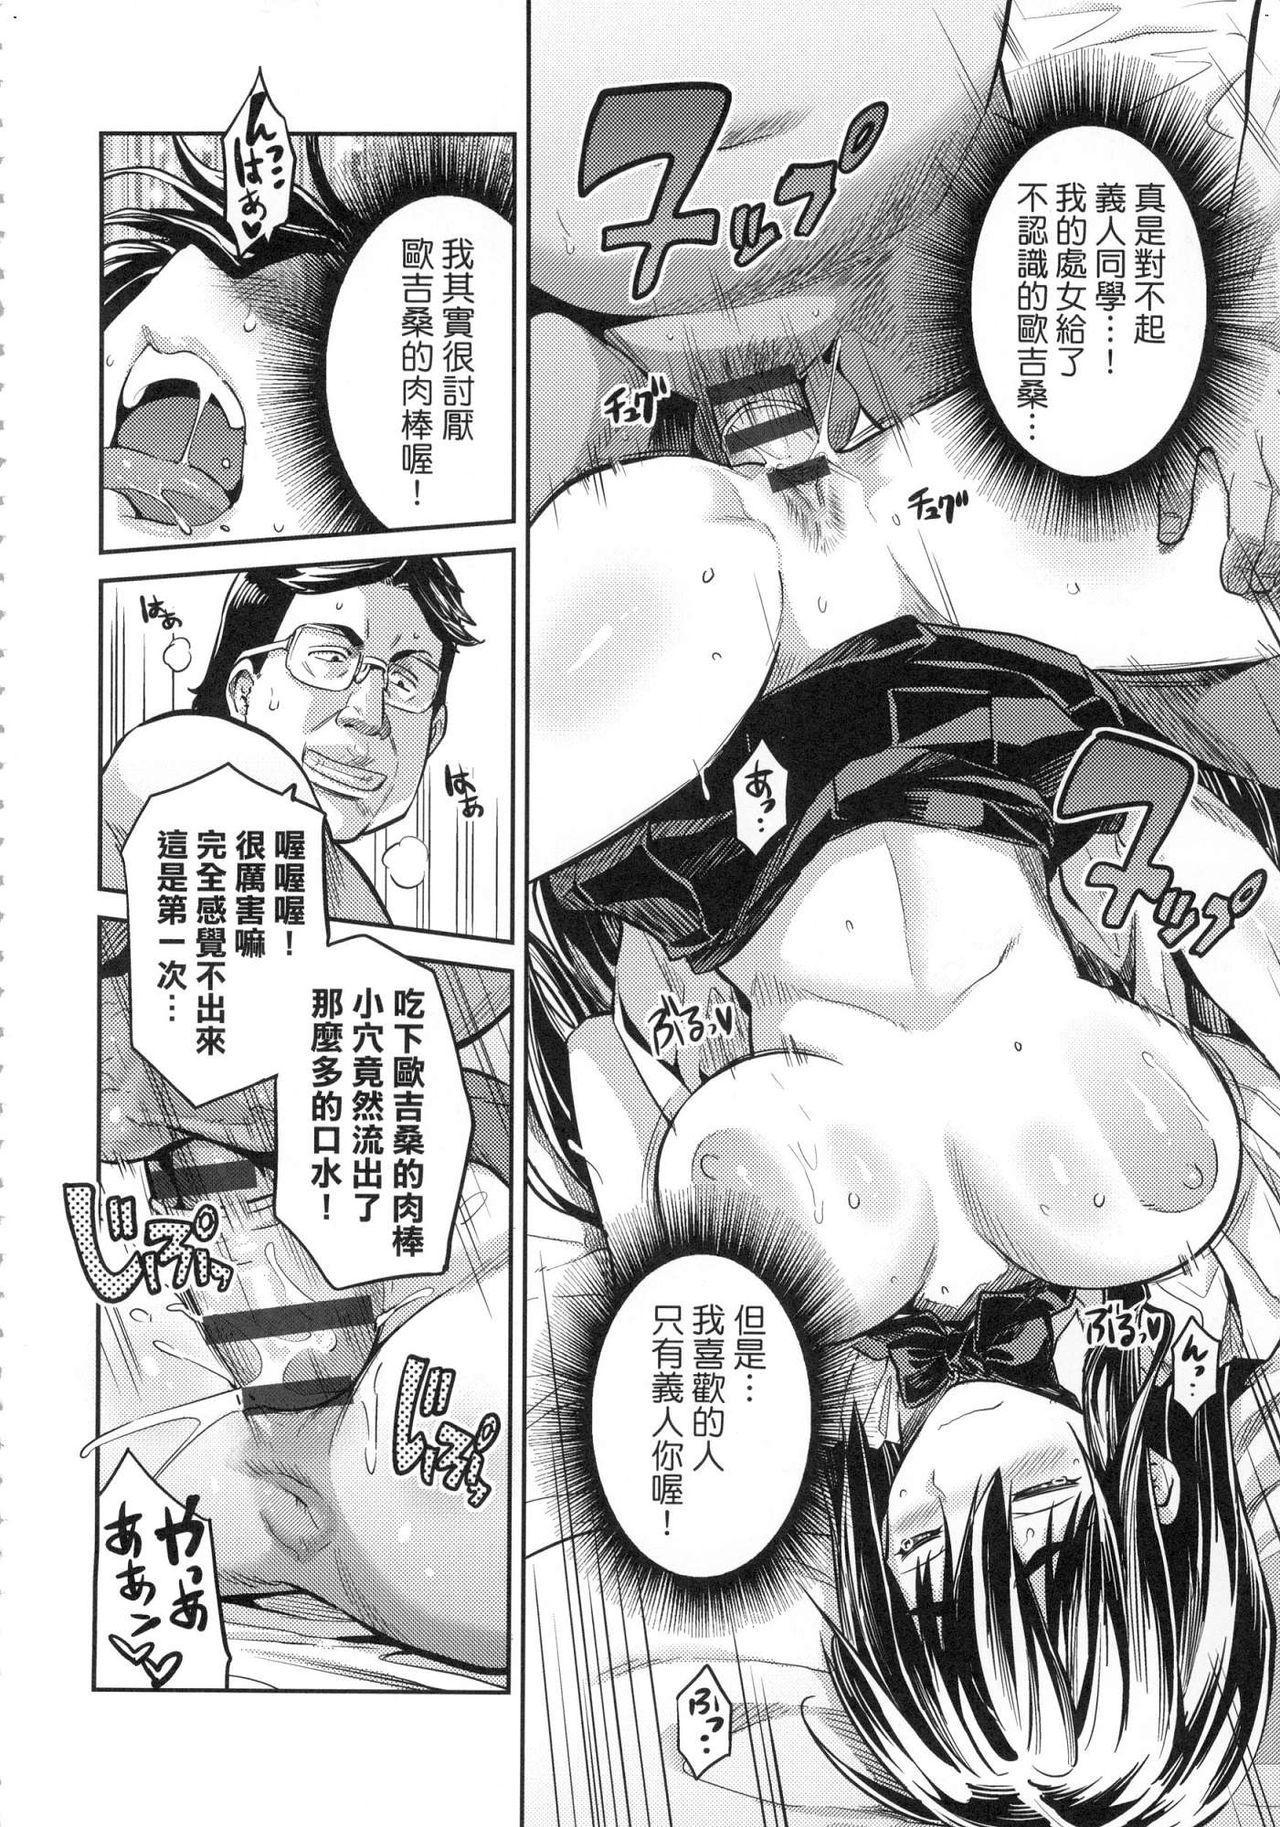 Kyousei Tanetsuke Express - Forced Seeding Express 141